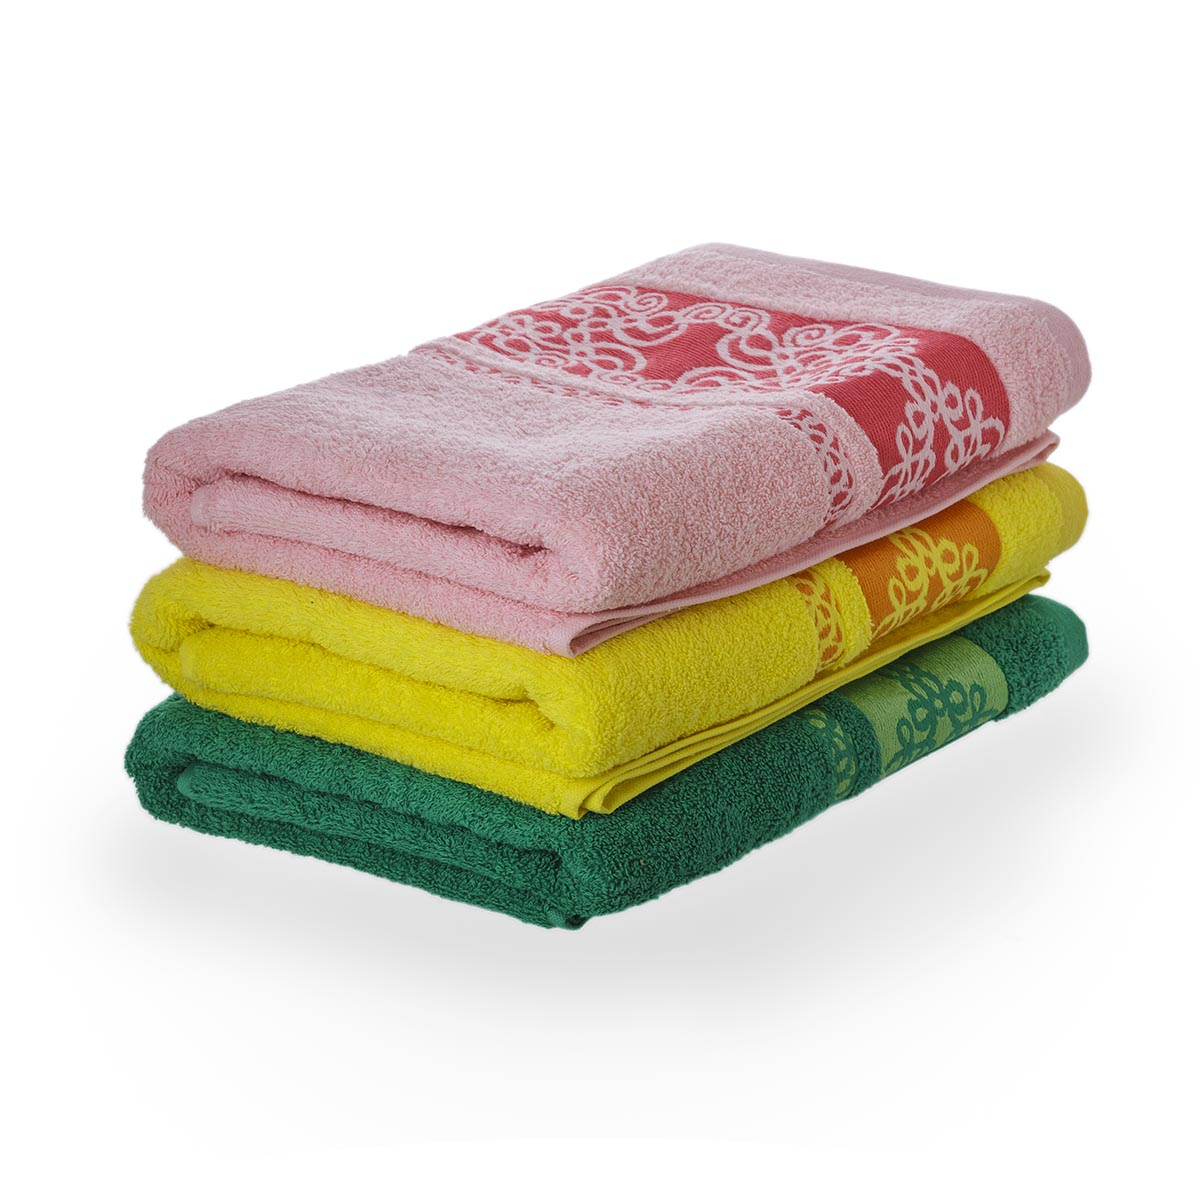 Полотенце Узор, цвет Синий, размер 50х90 смМахровые полотенца<br>Плотность ткани:420 г/кв. м.<br><br>Тип: Полотенце<br>Размер: 50х90<br>Материал: Махра